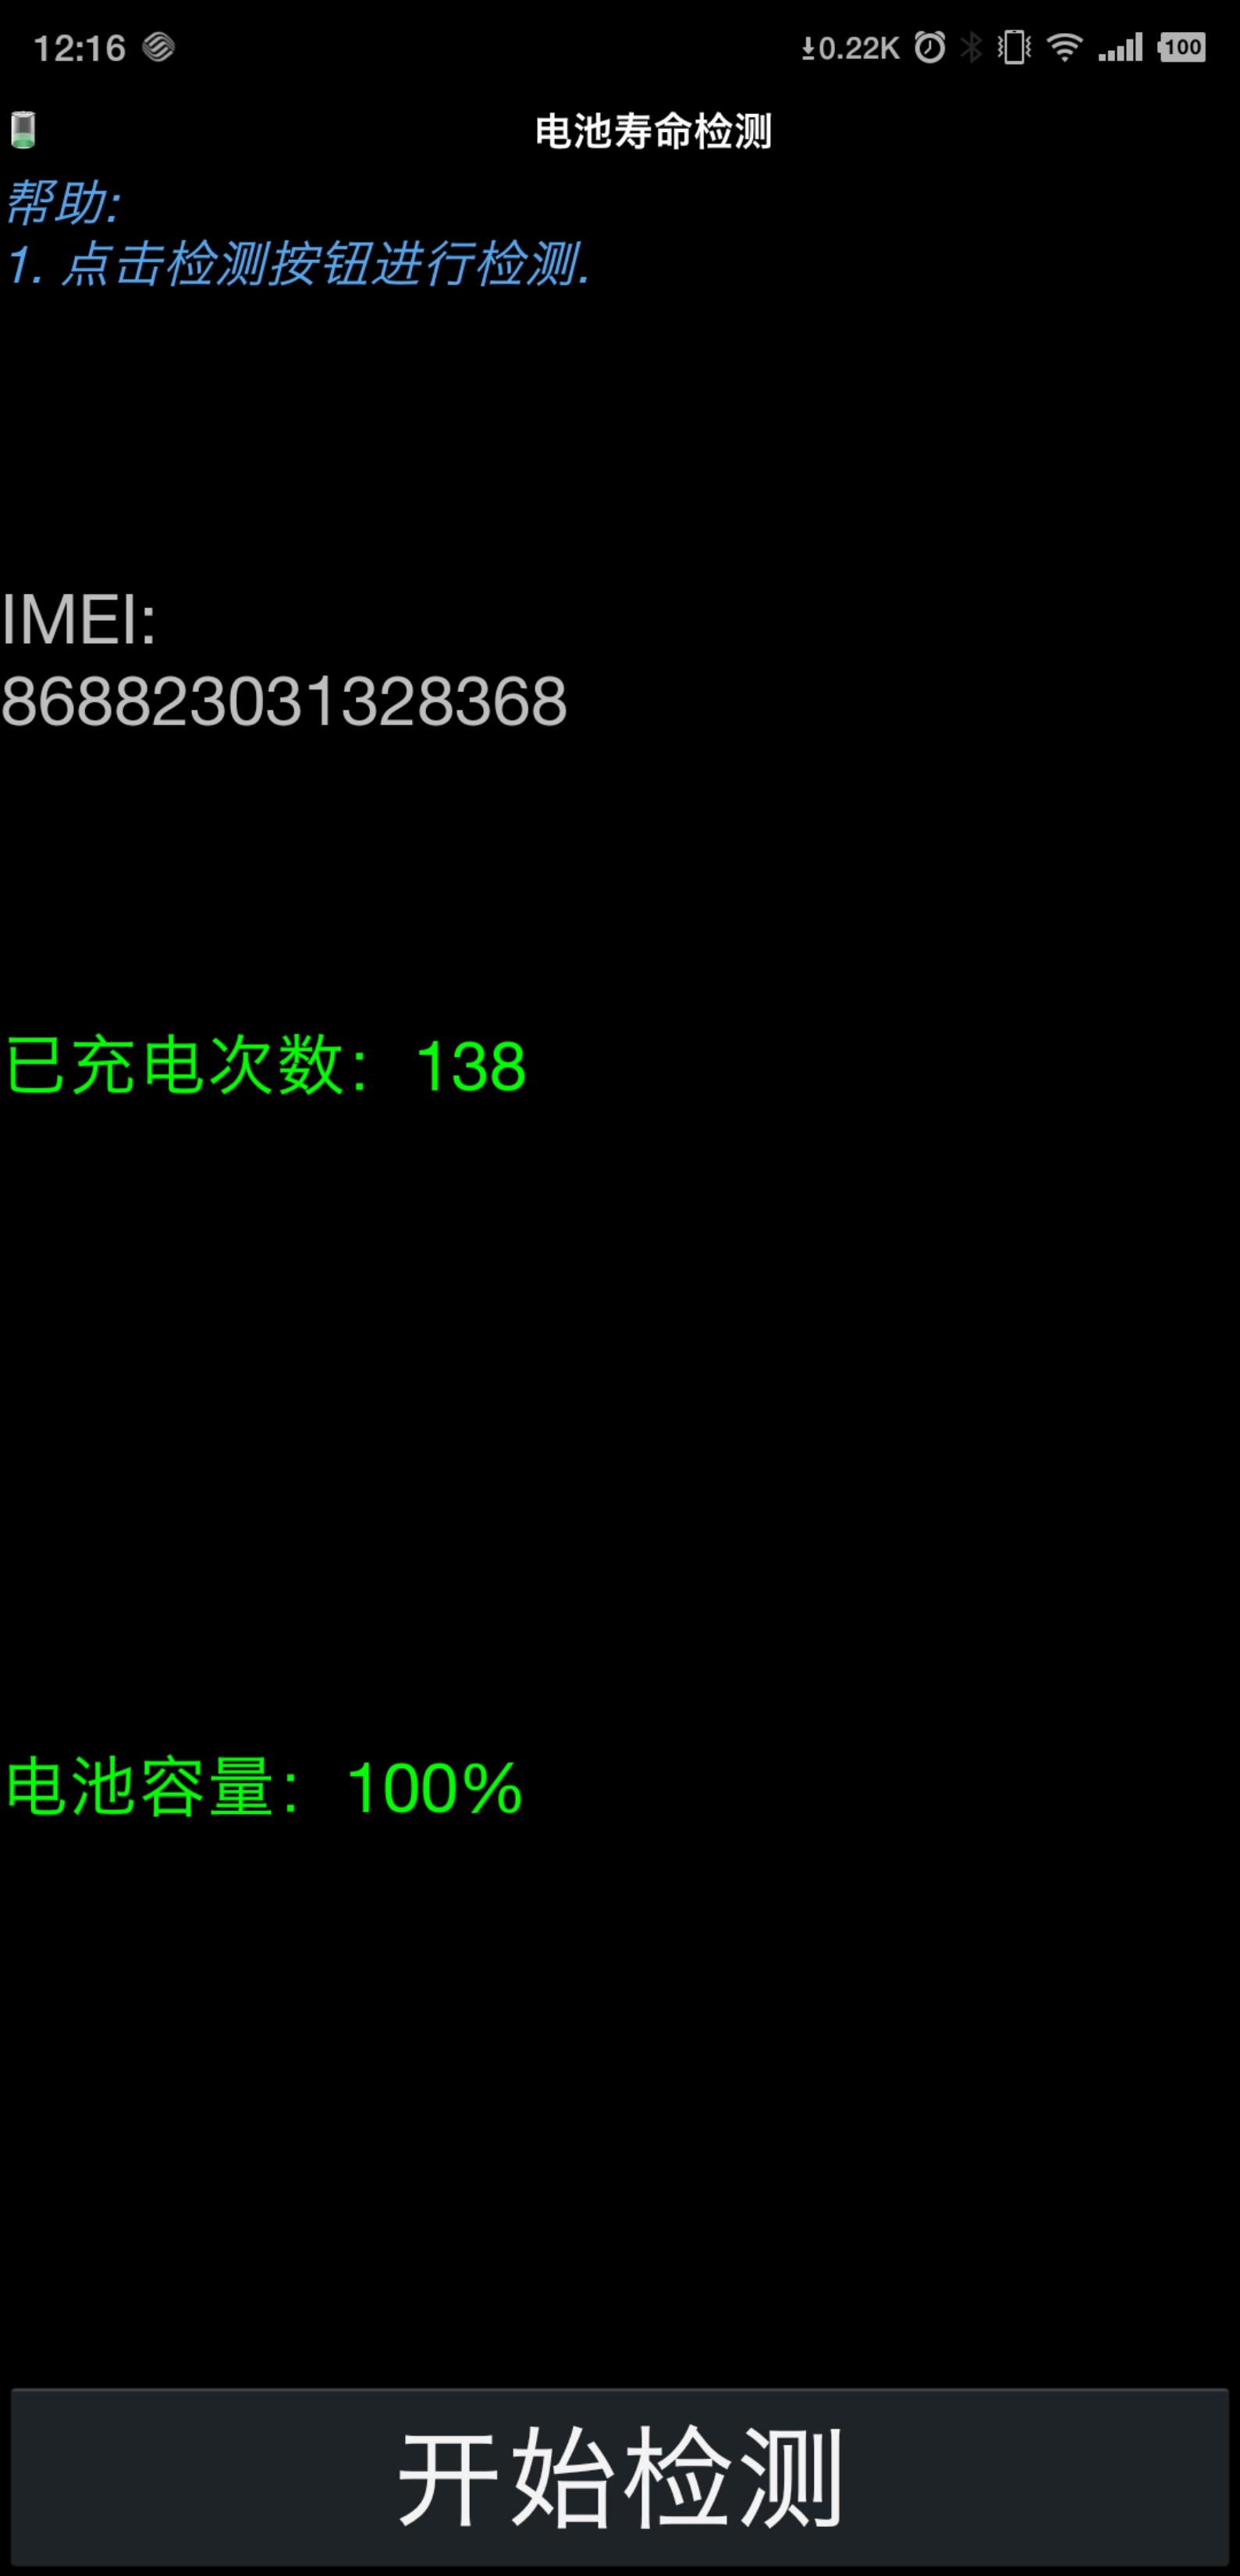 Screenshot_2018-10-26-12-16-39-085.png